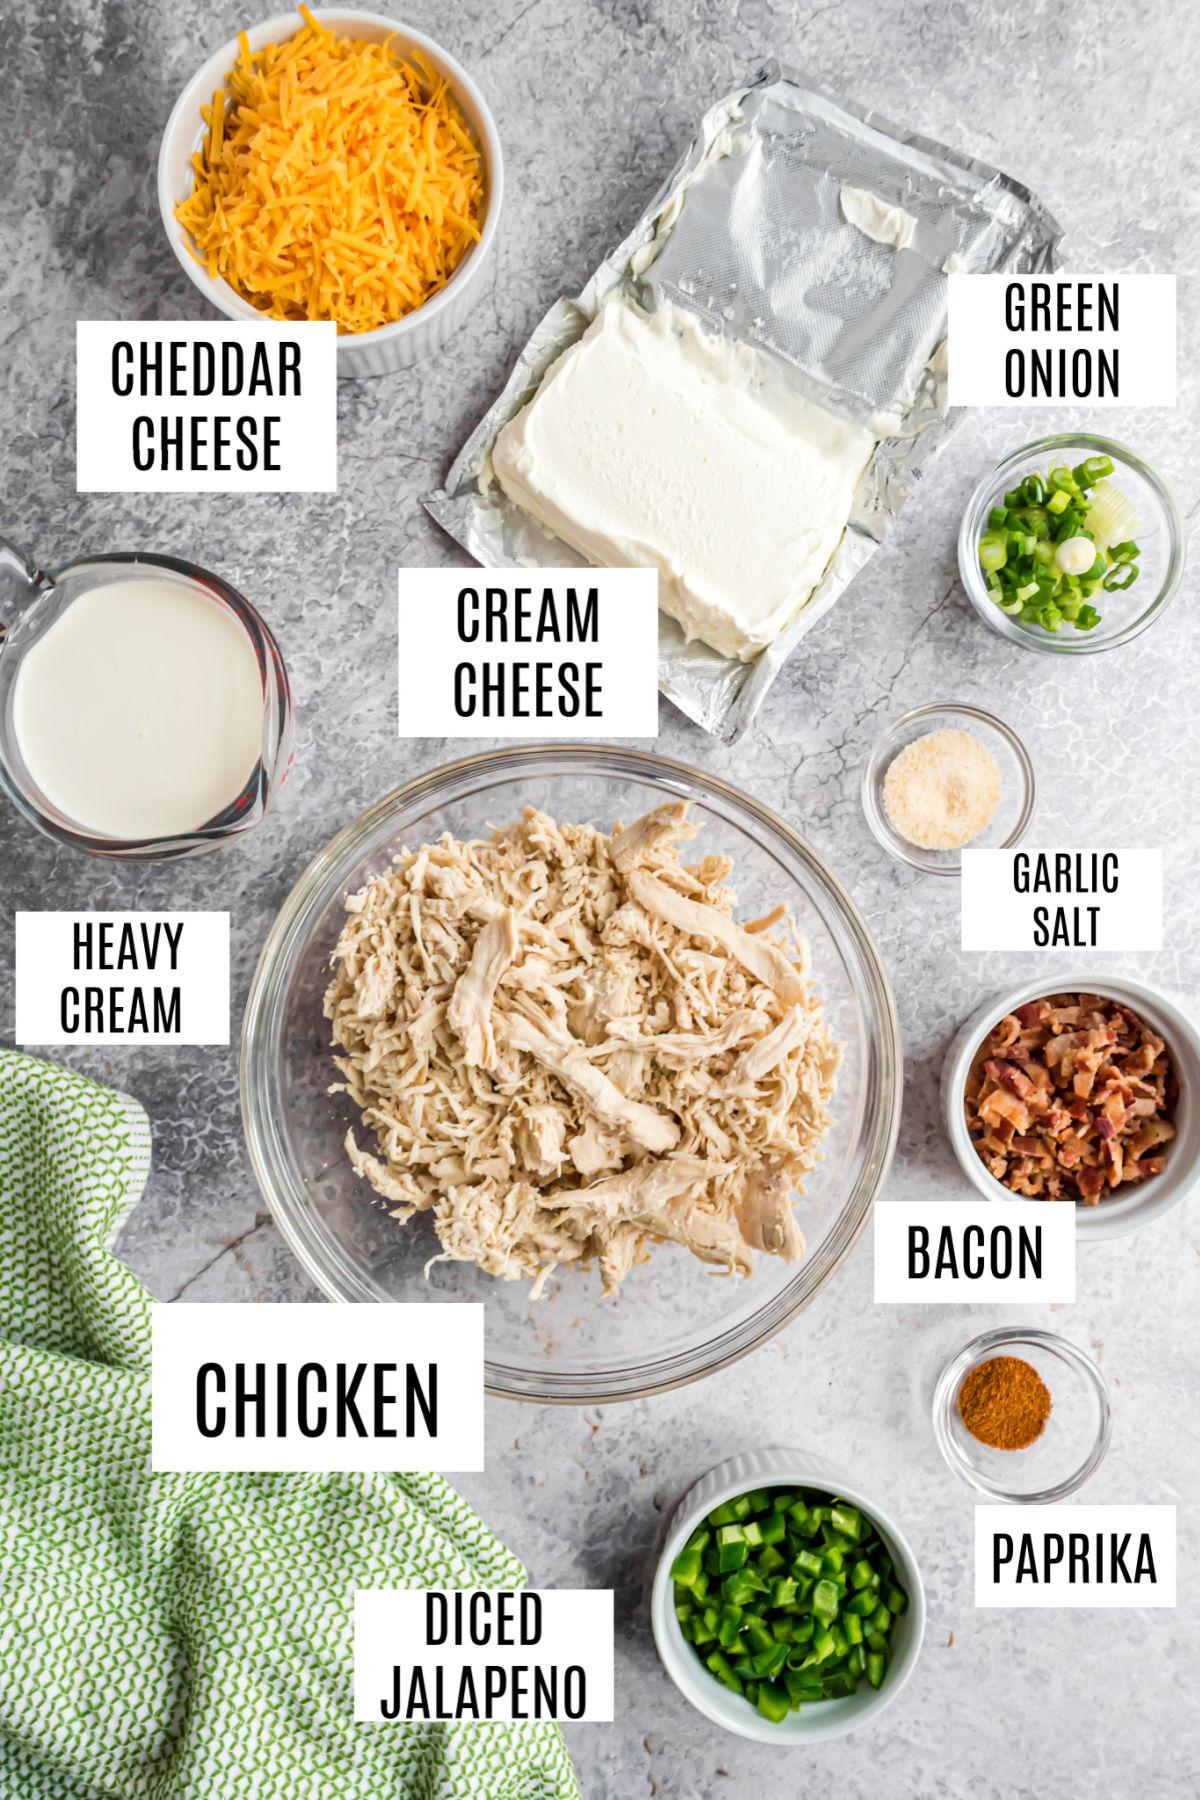 Ingredients needed to make jalapeno popper chicken.